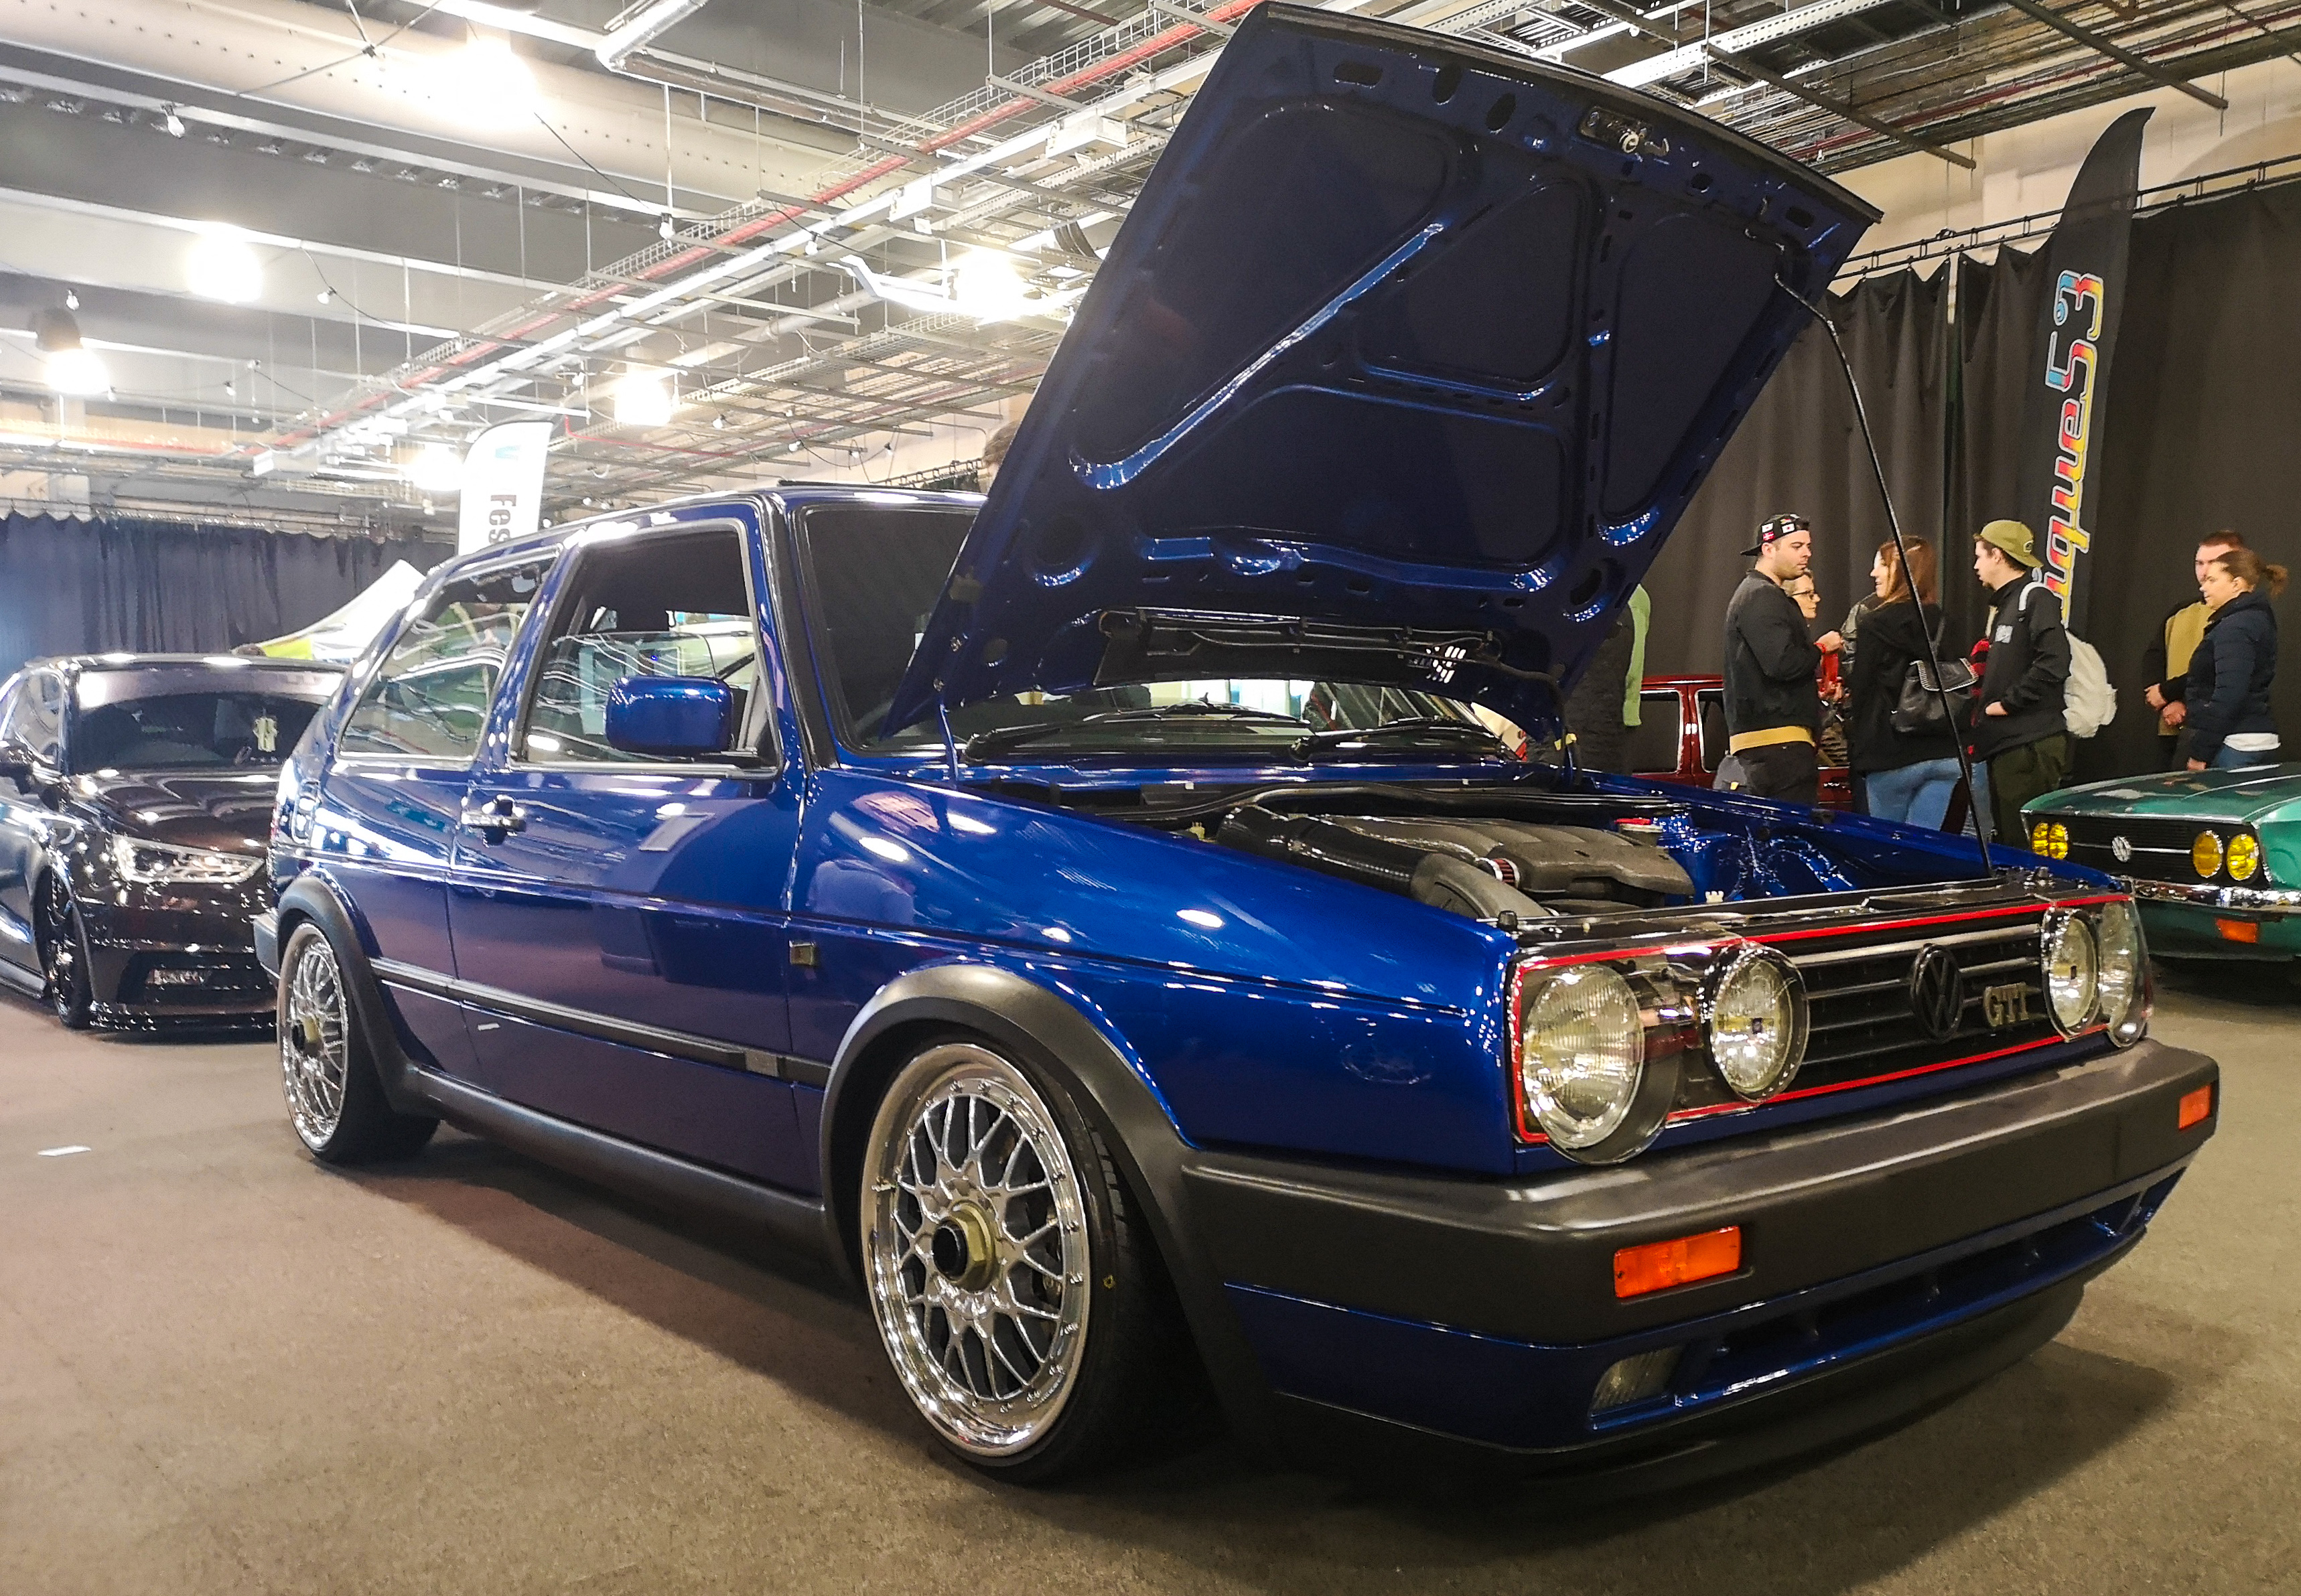 Bright Blue Metallic Golf GTI 16v